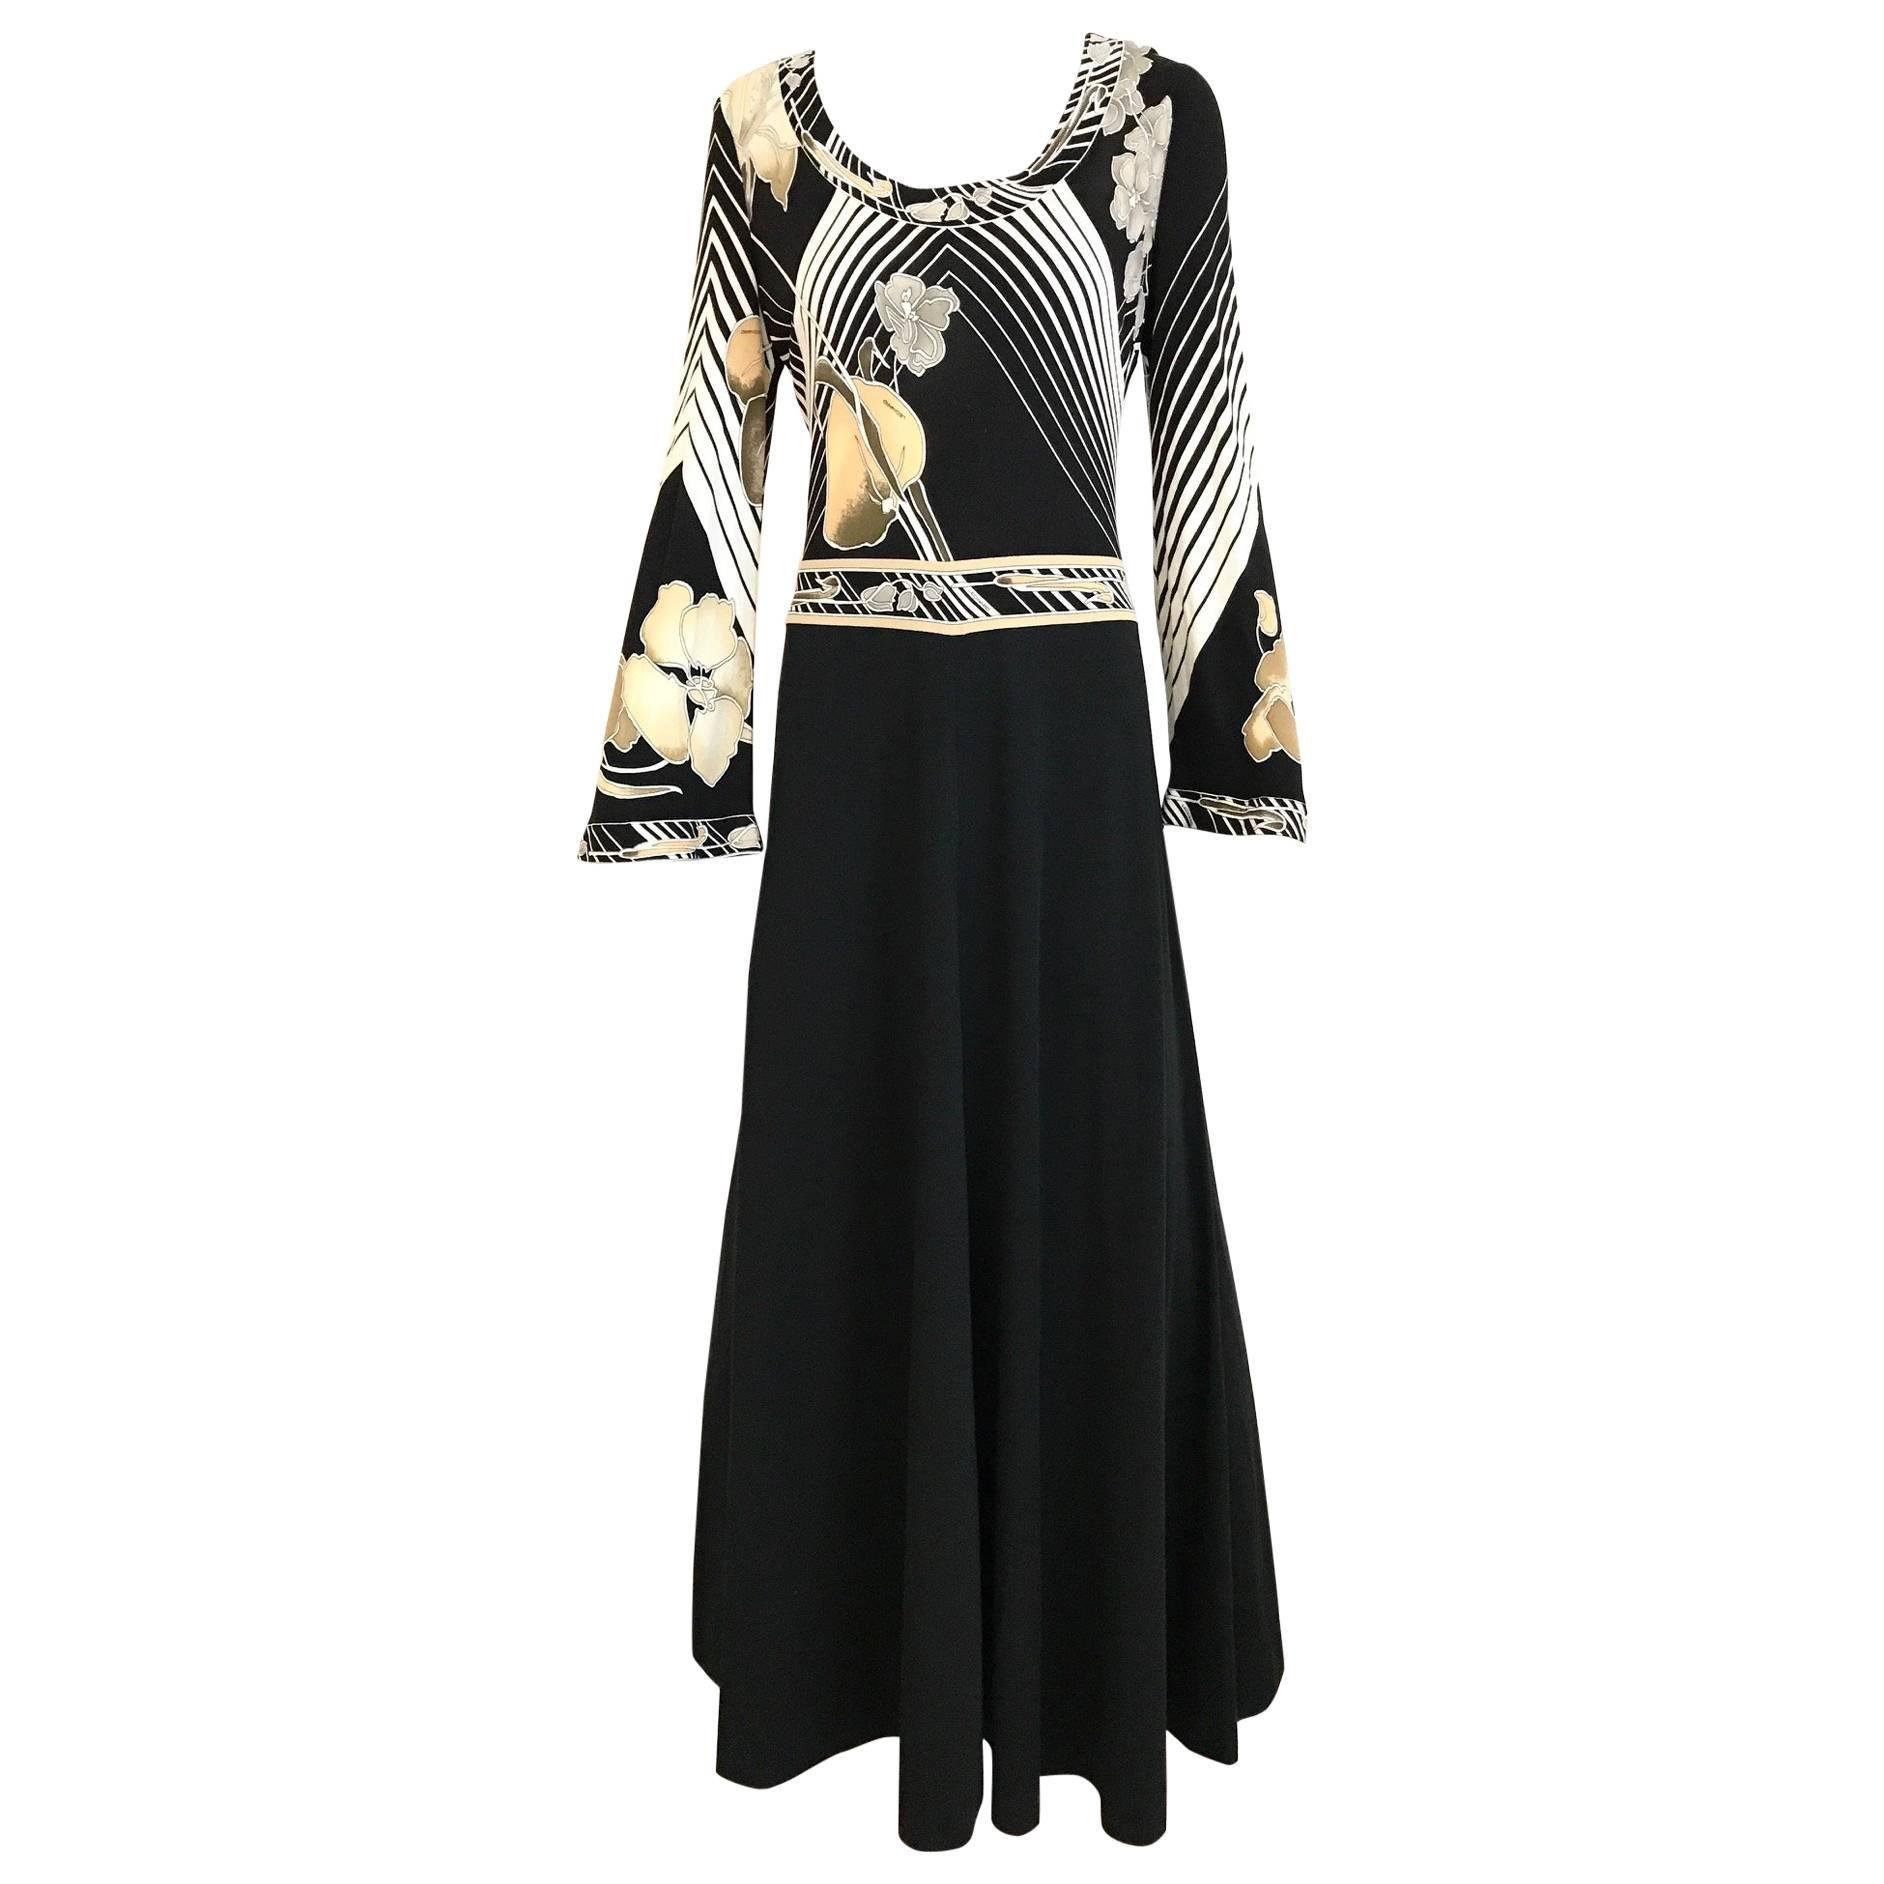 1970s Leonard Floral Print Black and White Jersey Maxi Dress